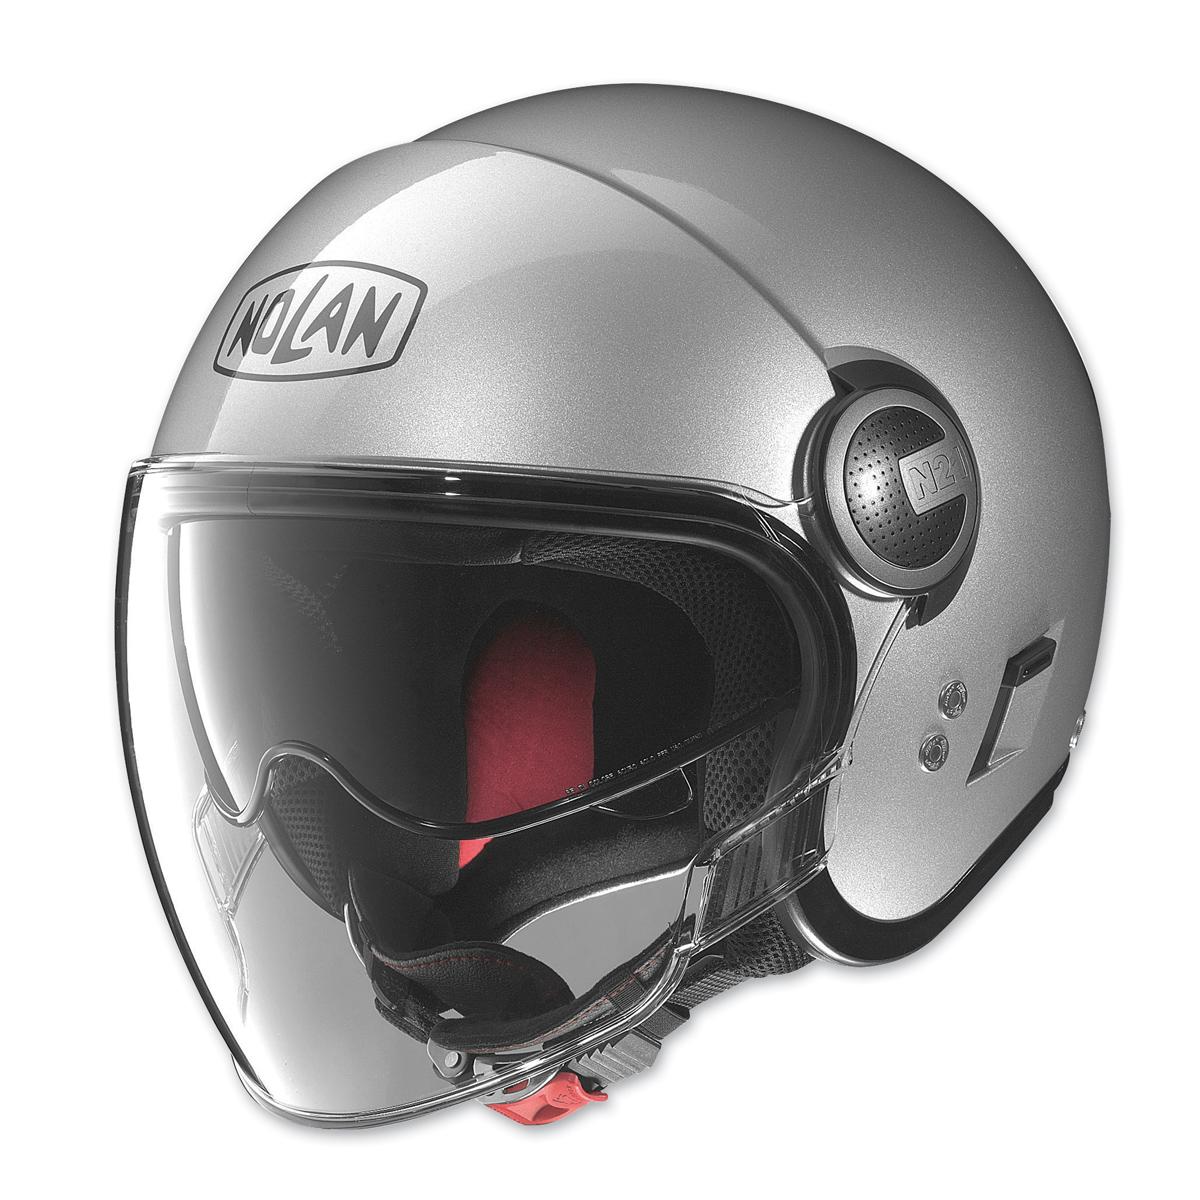 Nolan N21 Visor Silver Open Face Helmet